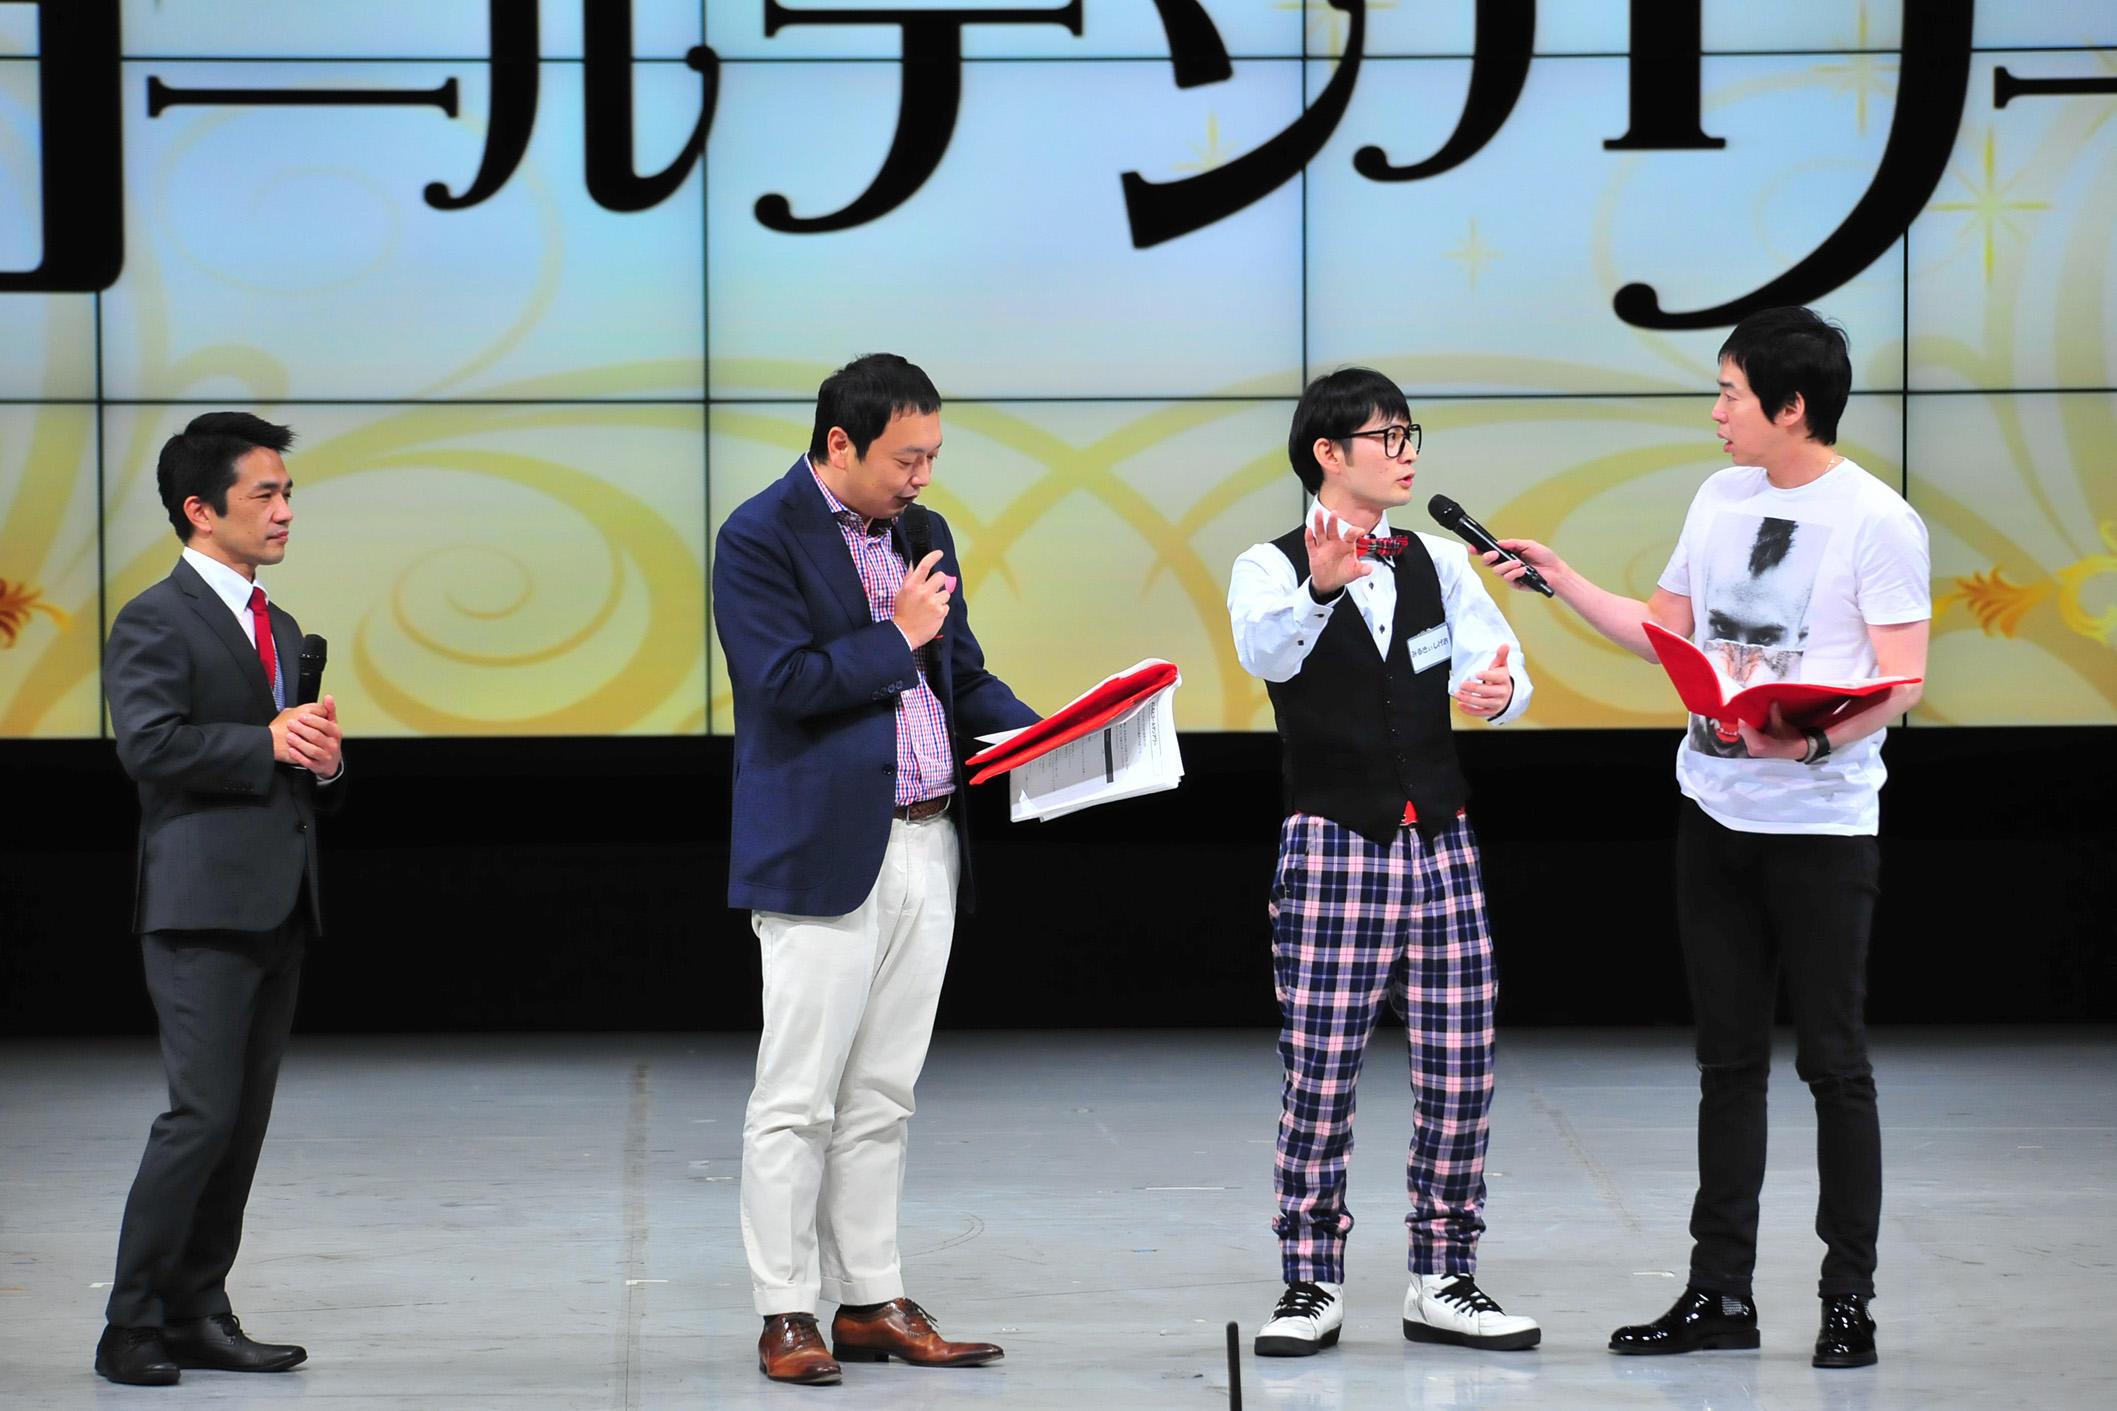 http://news.yoshimoto.co.jp/20160421122655-a033c3bfde89f5c20e730a30564c66ece3fbacdc.jpg